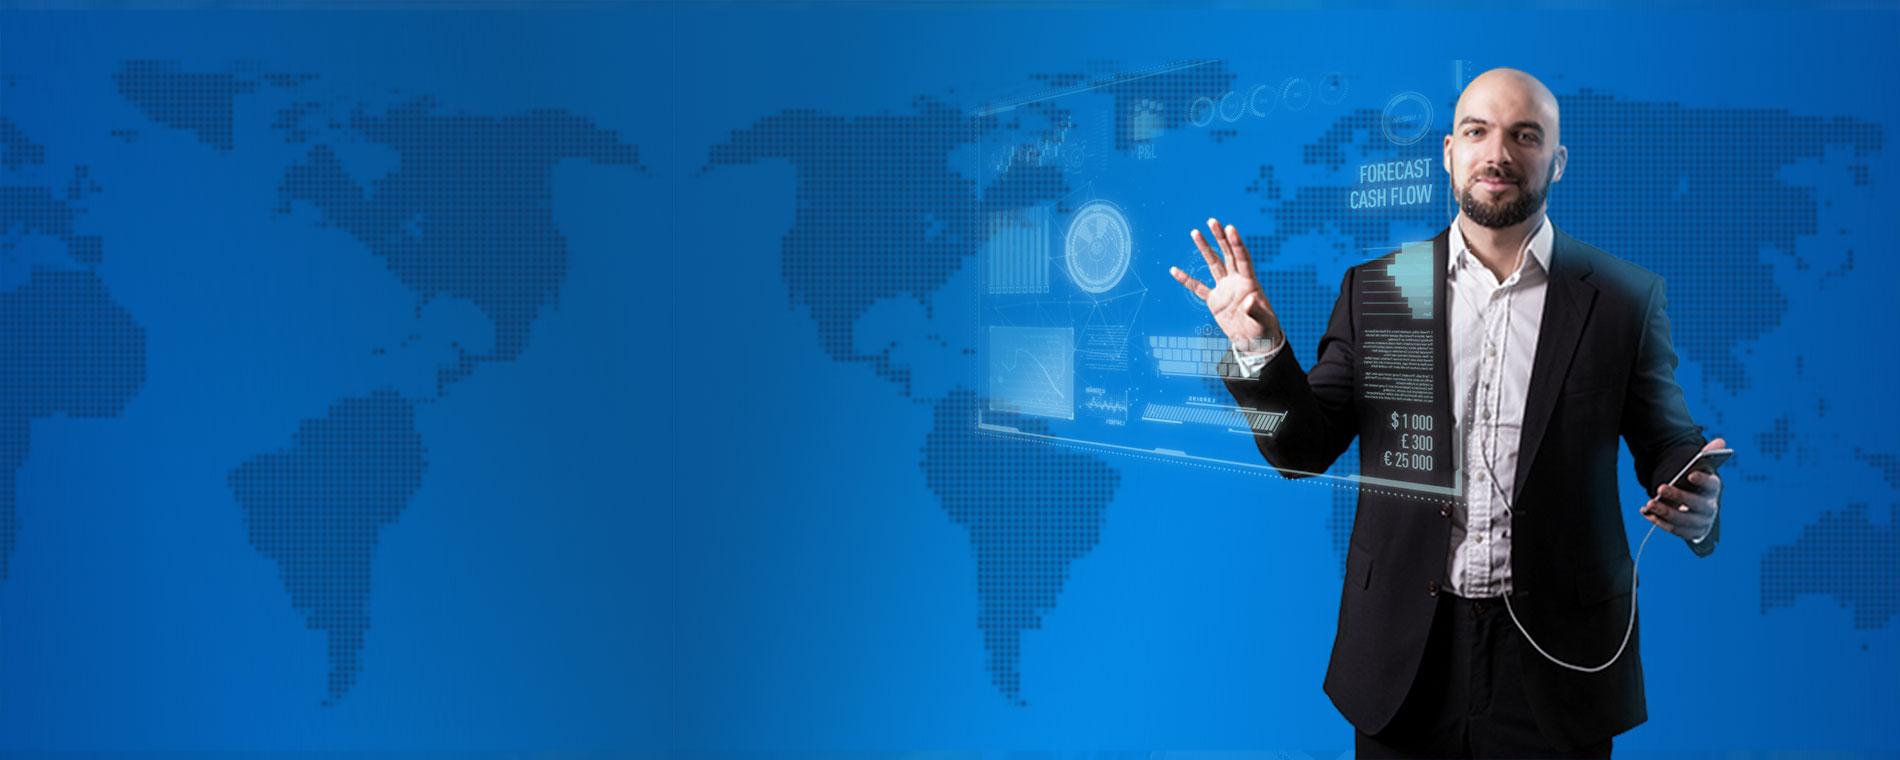 Global Operations Finance